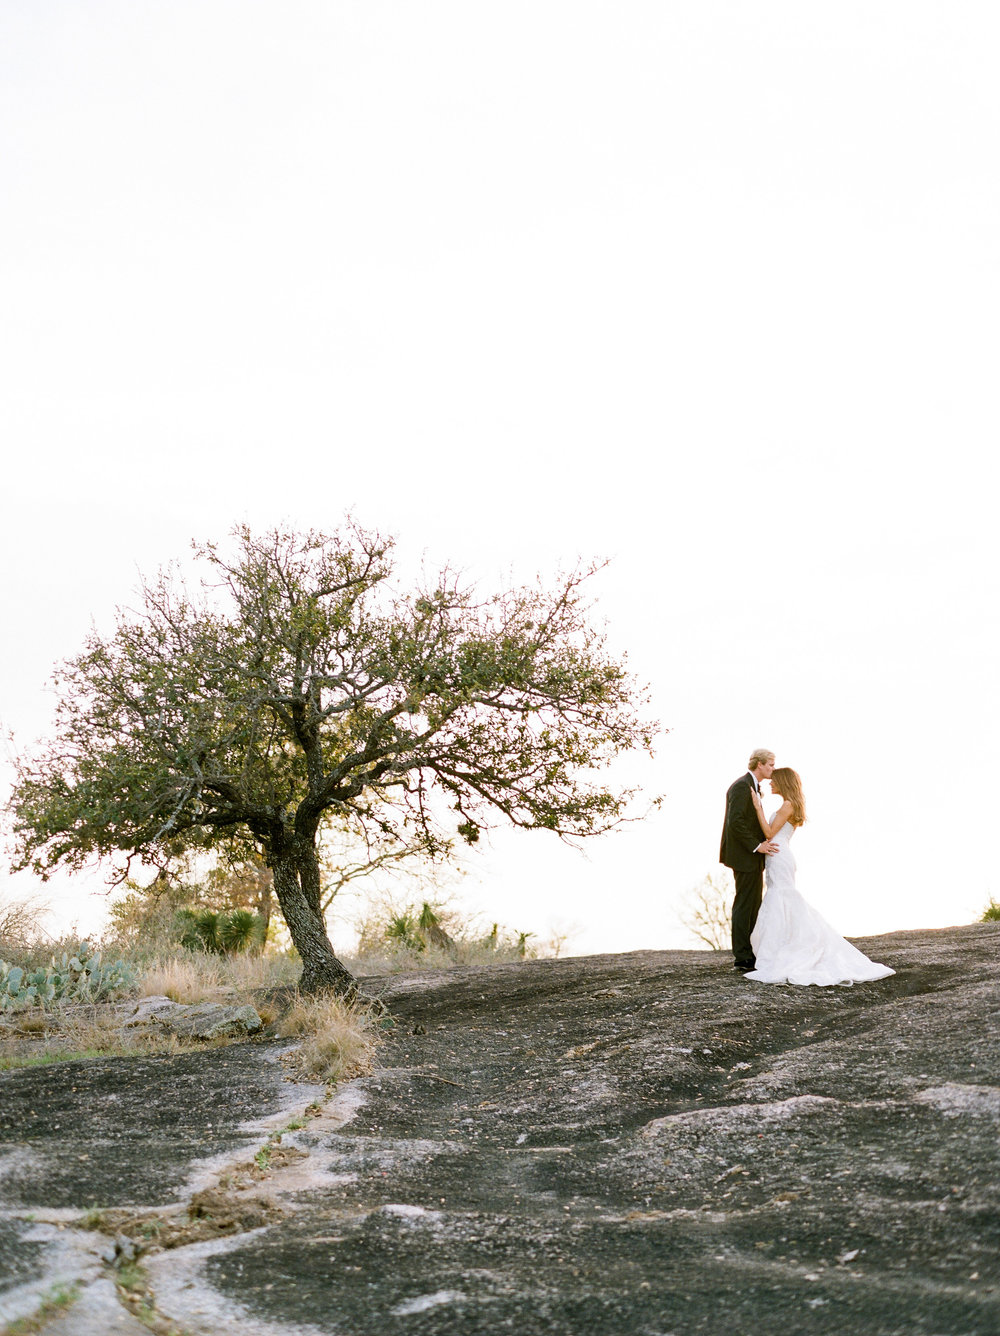 Escondido-Golf_Lake-Club-Hill-Country-Houston-Wedding-Photographer-Best-Top-Luxury-Destination-Engagements-Portrait-Austin-Photography-32.jpg